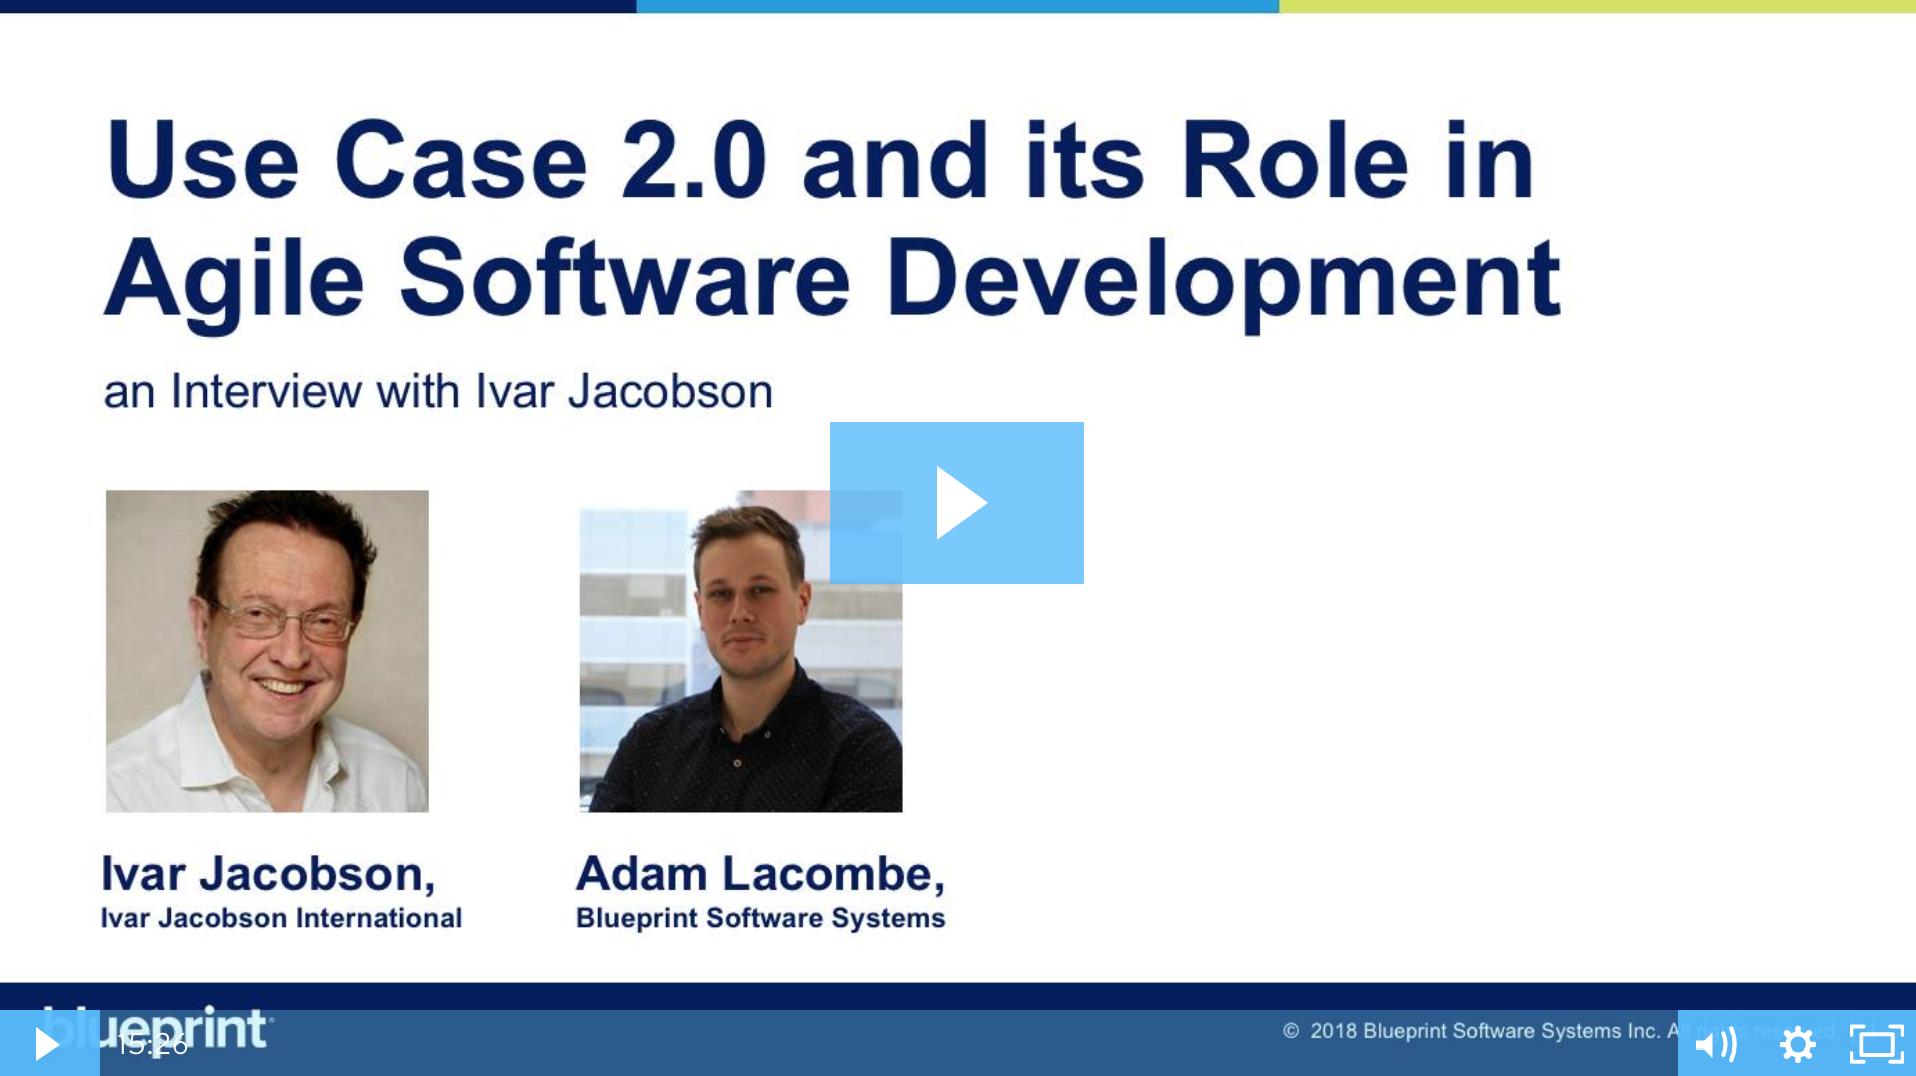 Ivar Jacobson on Use Case 2.0